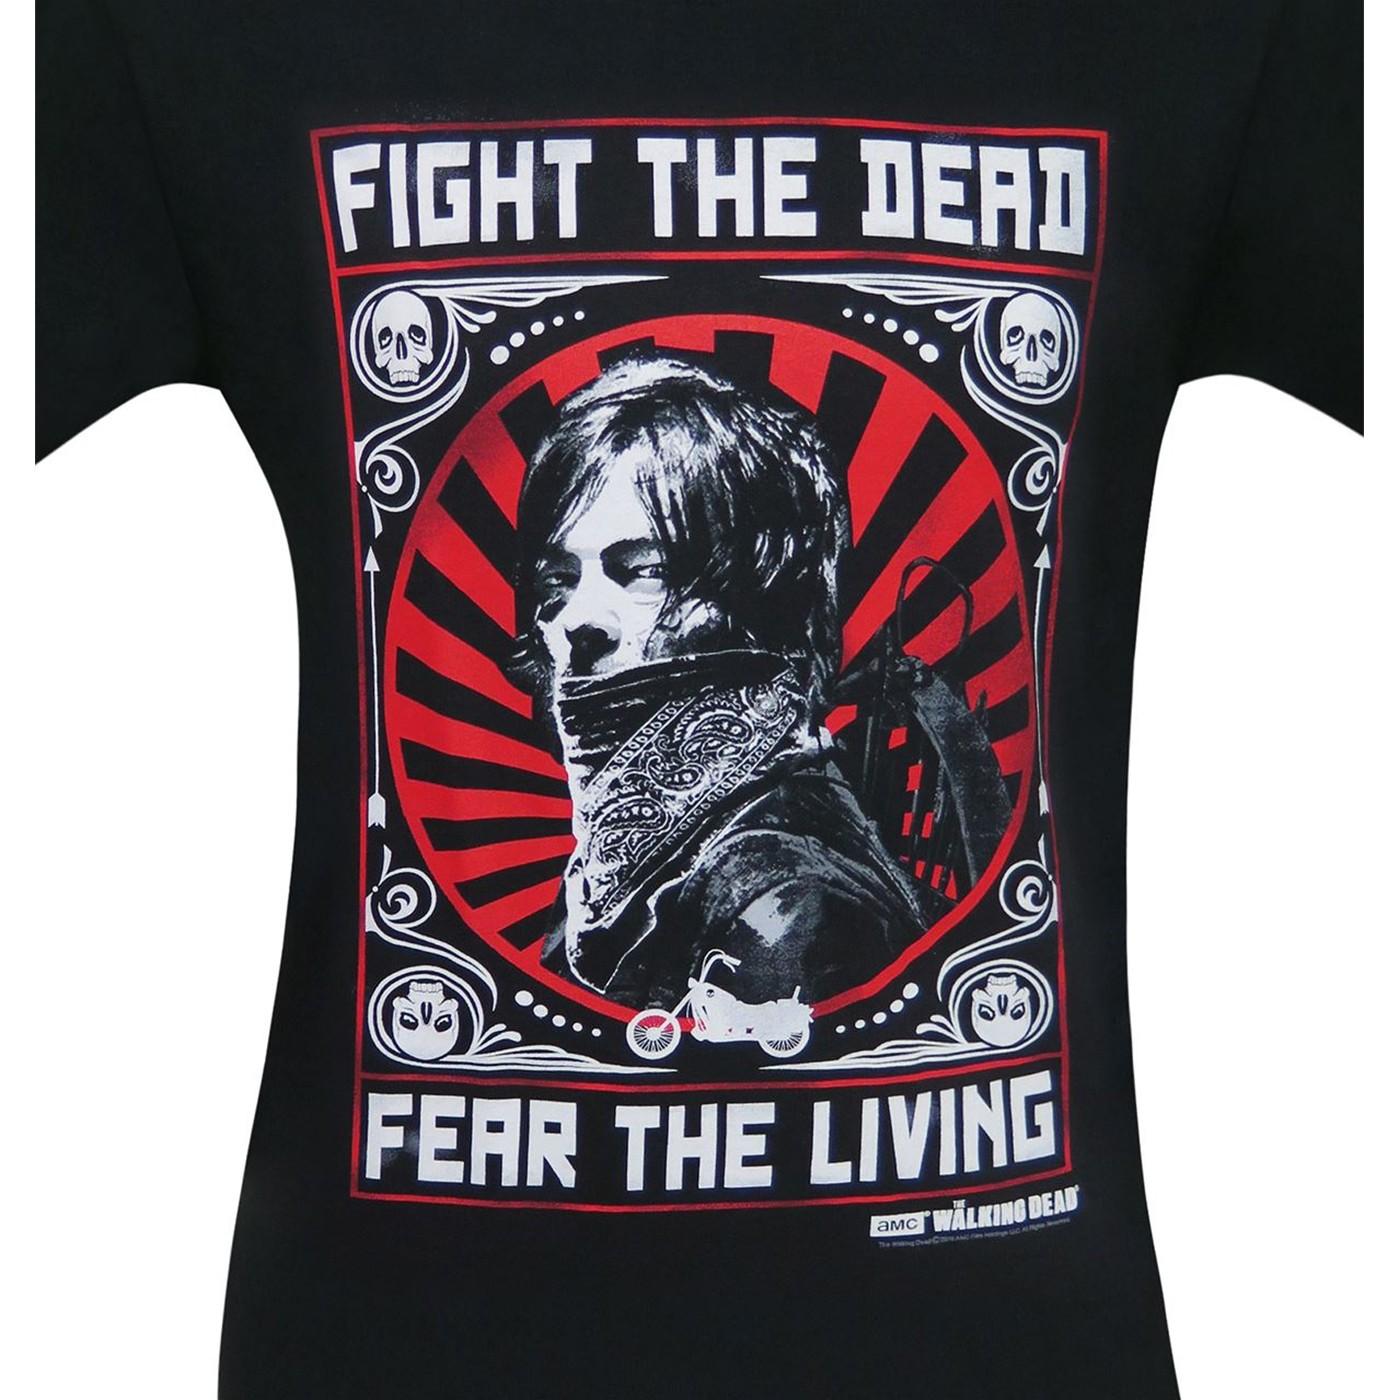 Walking Dead Daryl Dixon Fight The Dead Men's T-Shirt